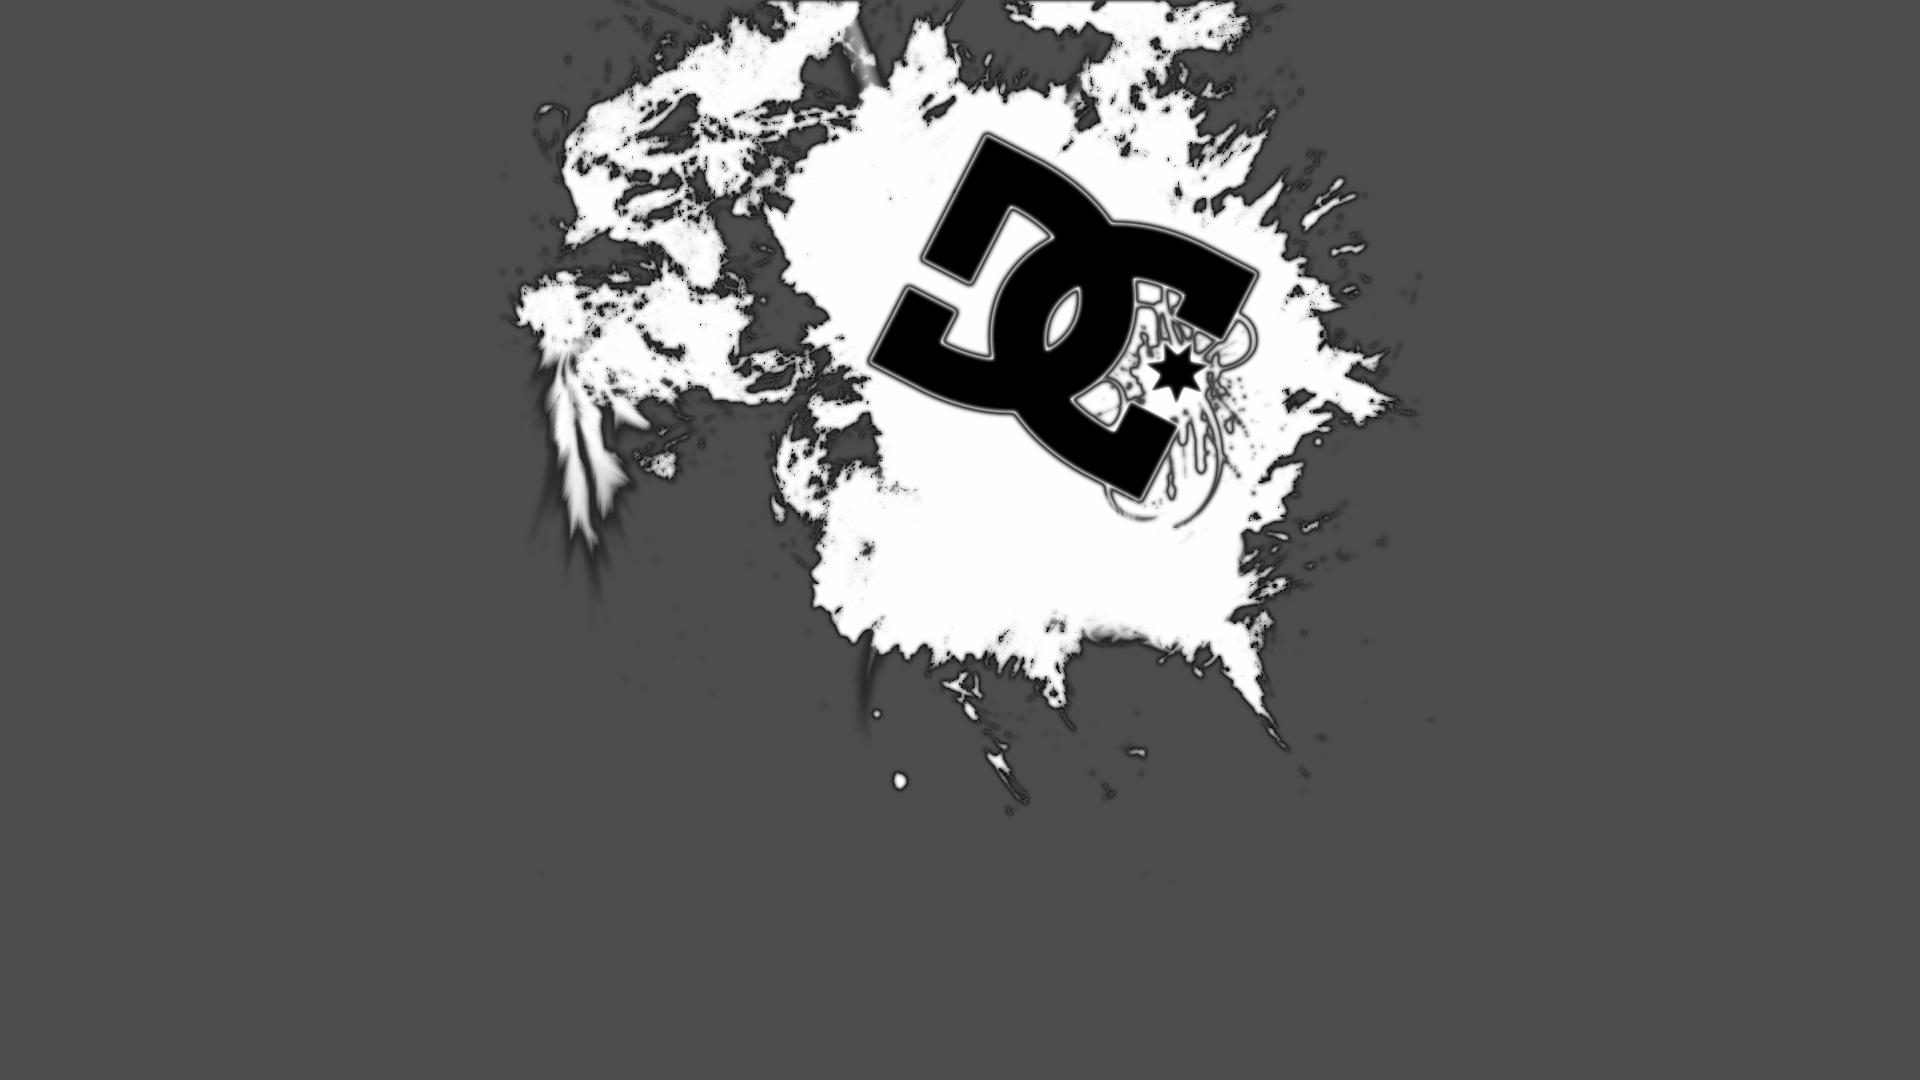 Dc Shoes Logobilder nAxaFzNiUN